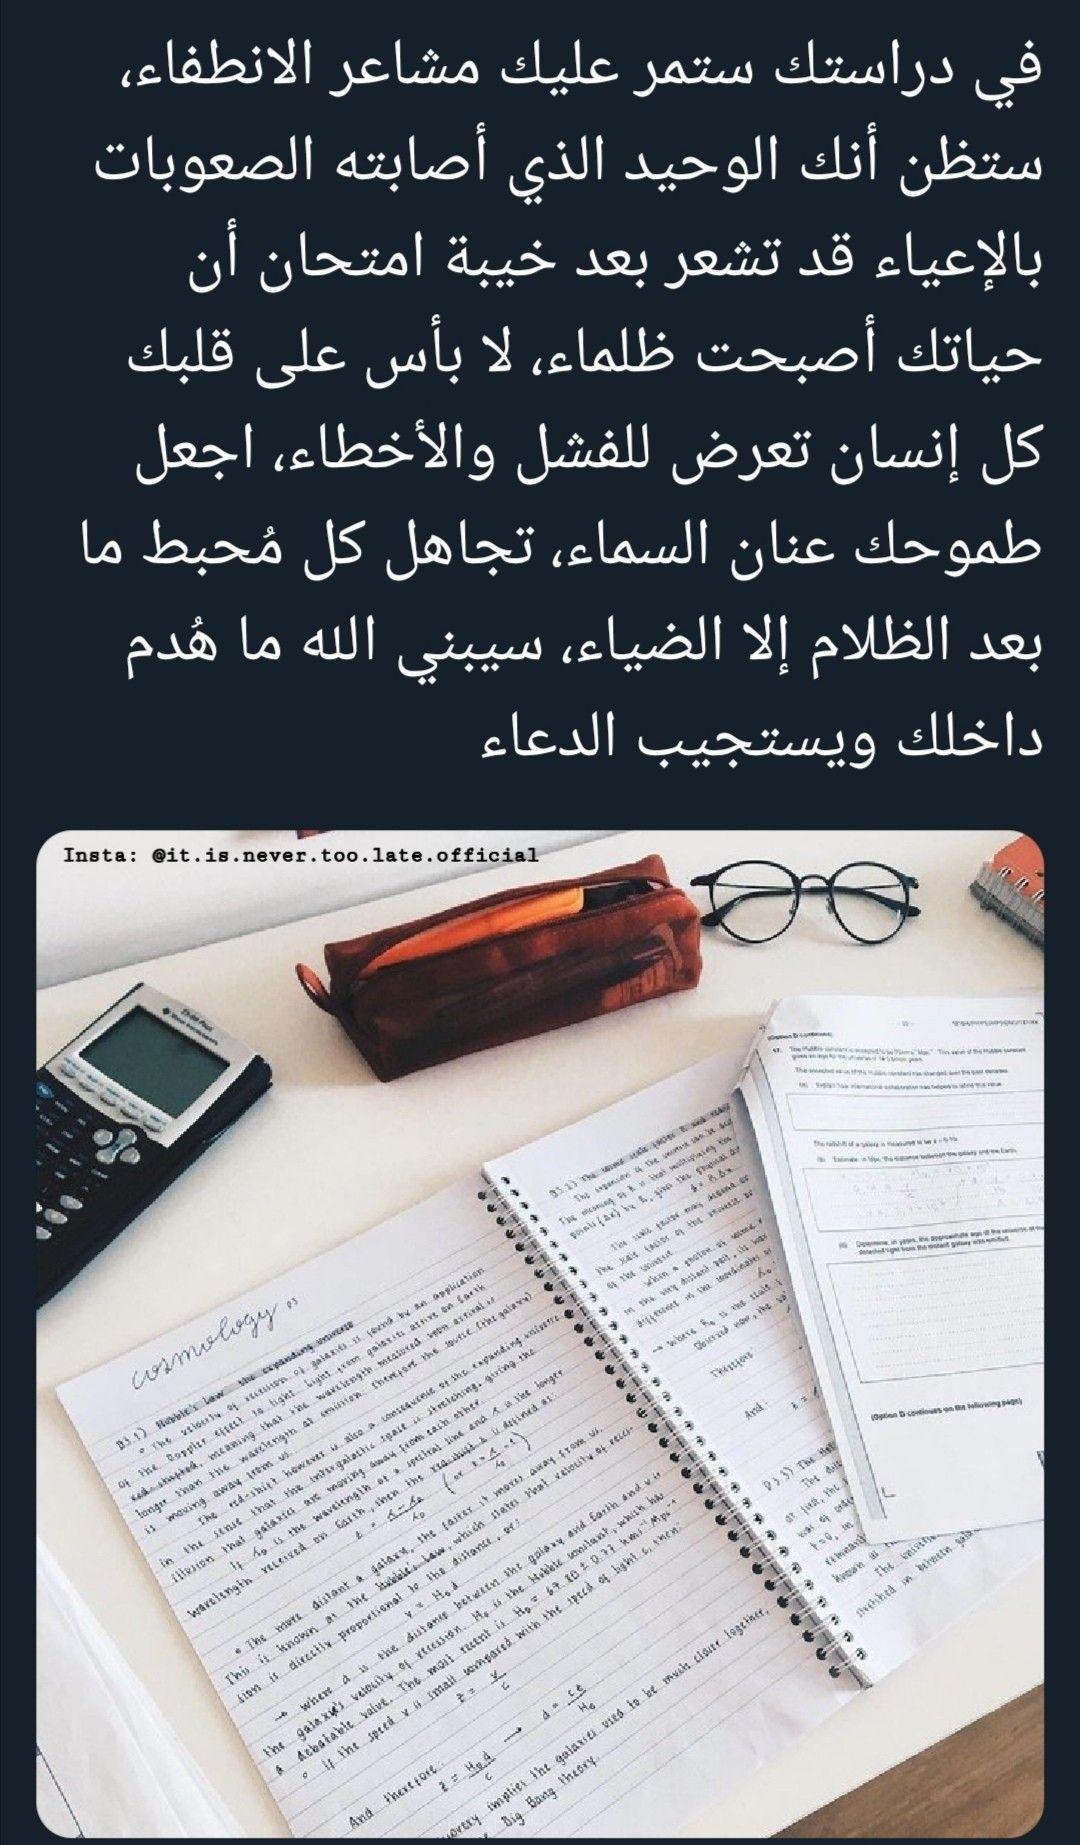 Pin By Renad On اقتباسات Funny Study Quotes Study Motivation Quotes Study Quotes